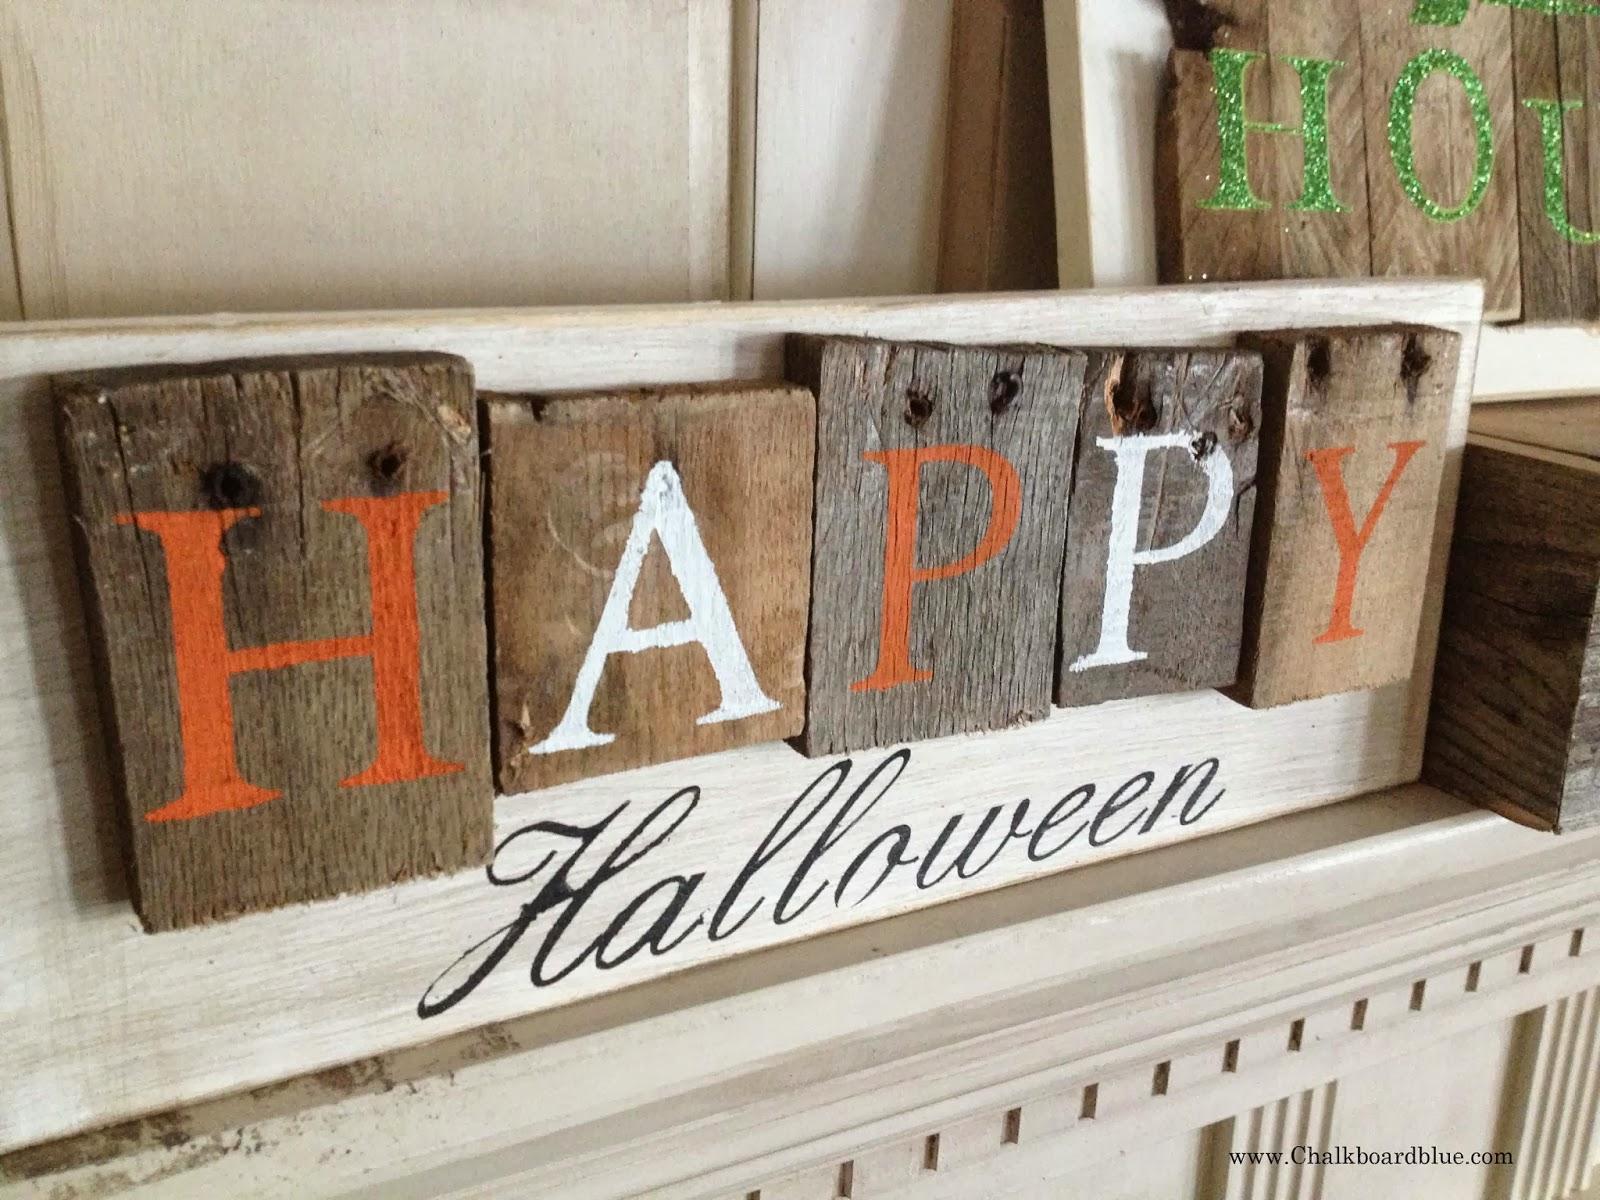 wood sign design ideas chalkboard blue pallet style halloween signs - Wood Sign Design Ideas